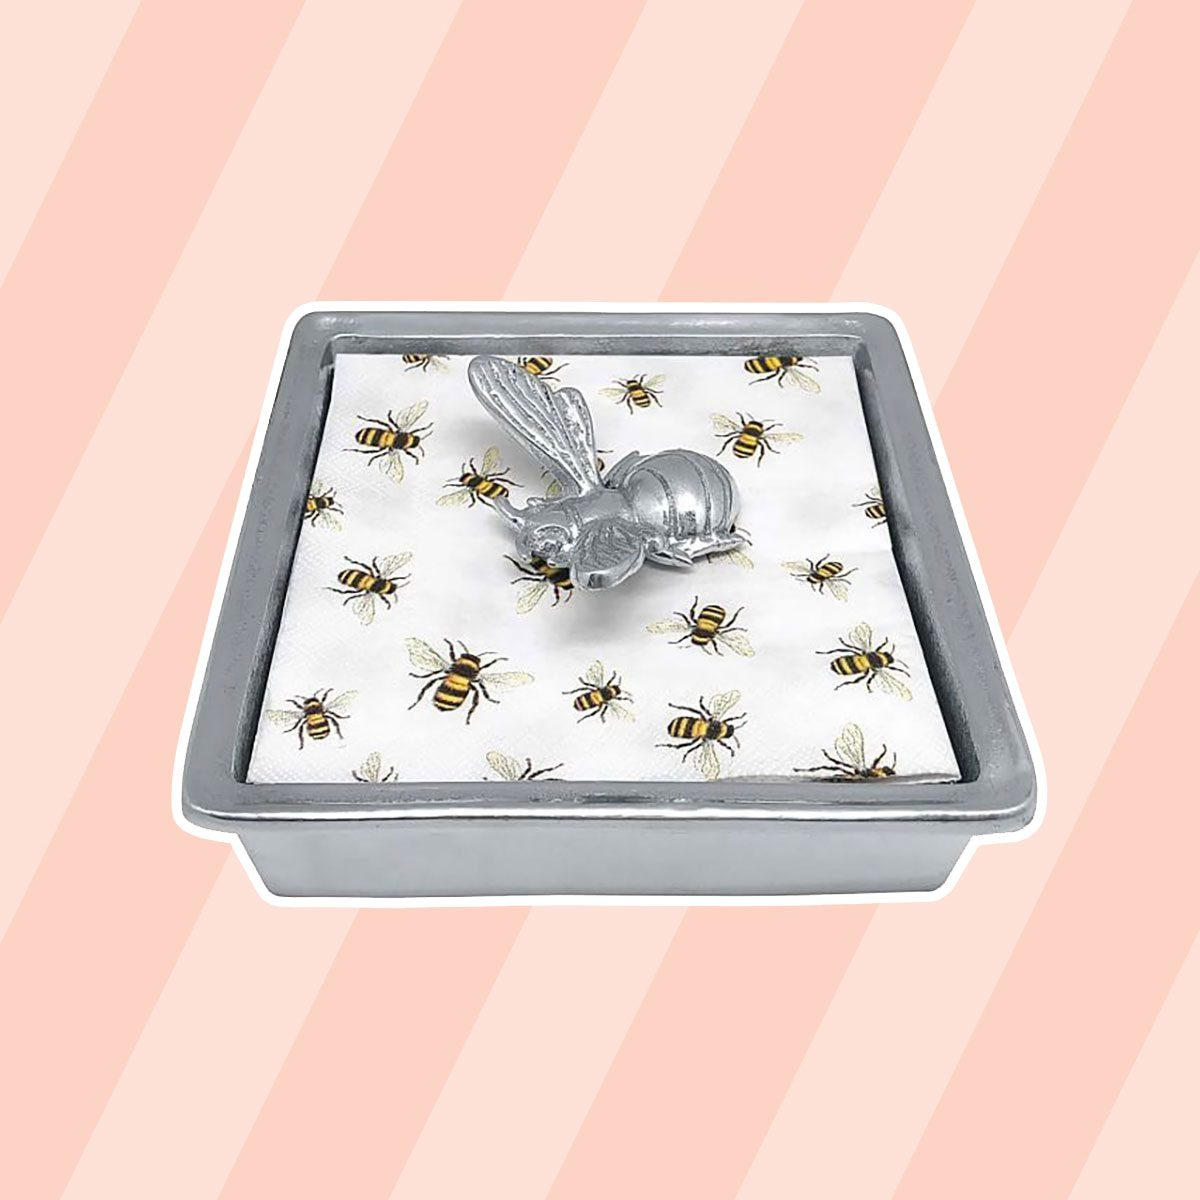 Pottery Barn Honey Bee Recycled Metal Napkin Holder